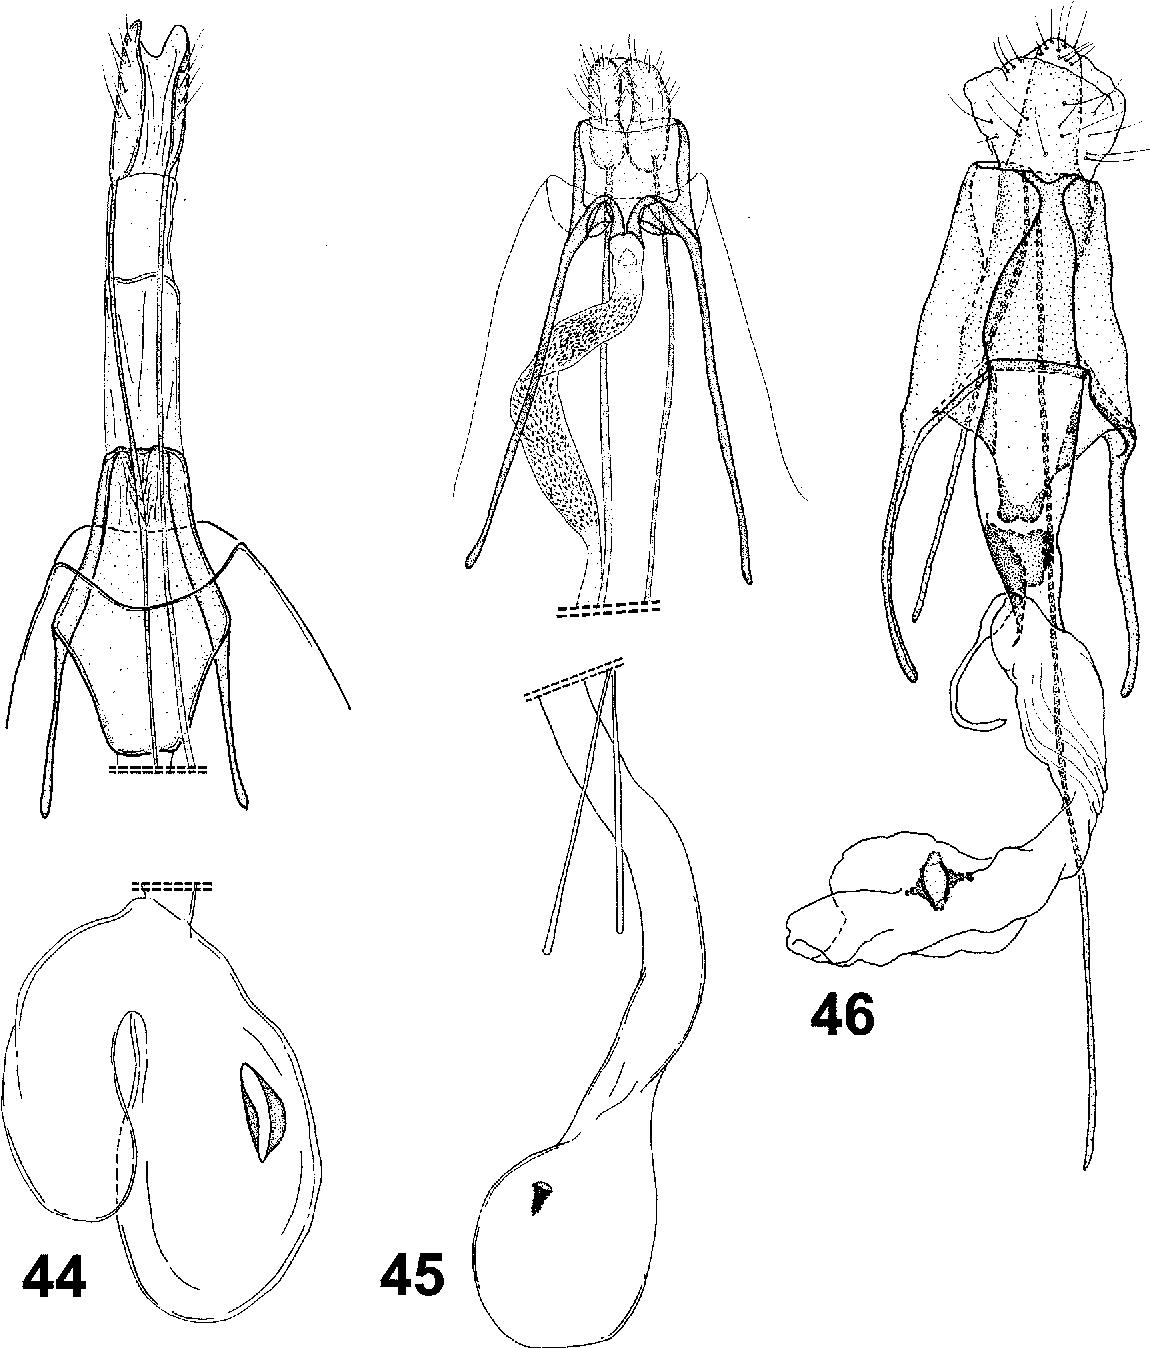 figure 44–46